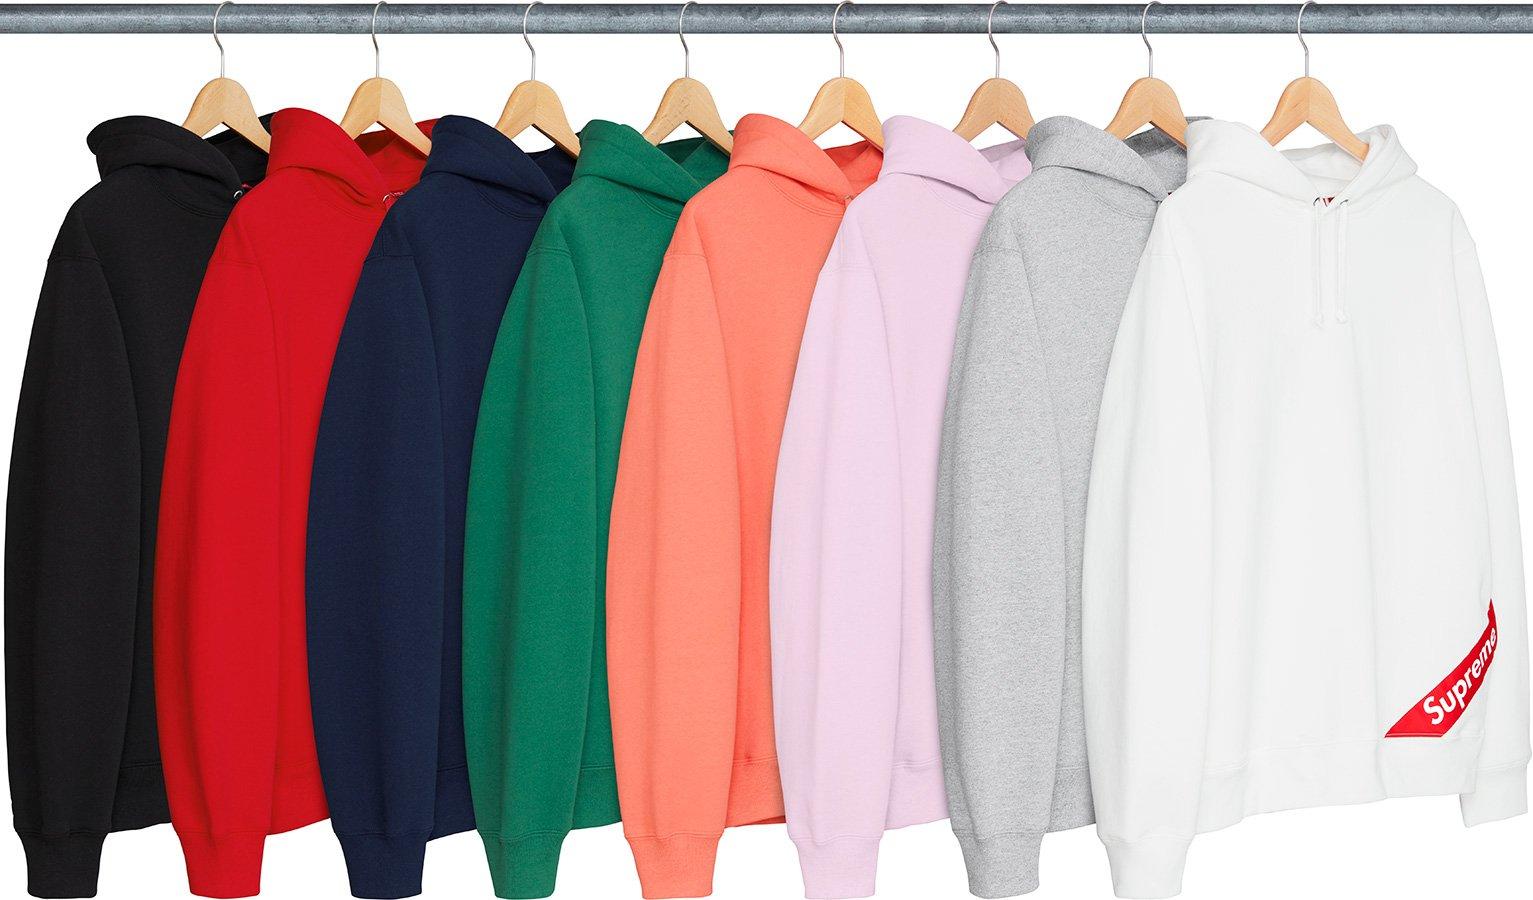 Details Supreme Corner Label Hooded Sweatshirt Supreme Community [ 900 x 1533 Pixel ]